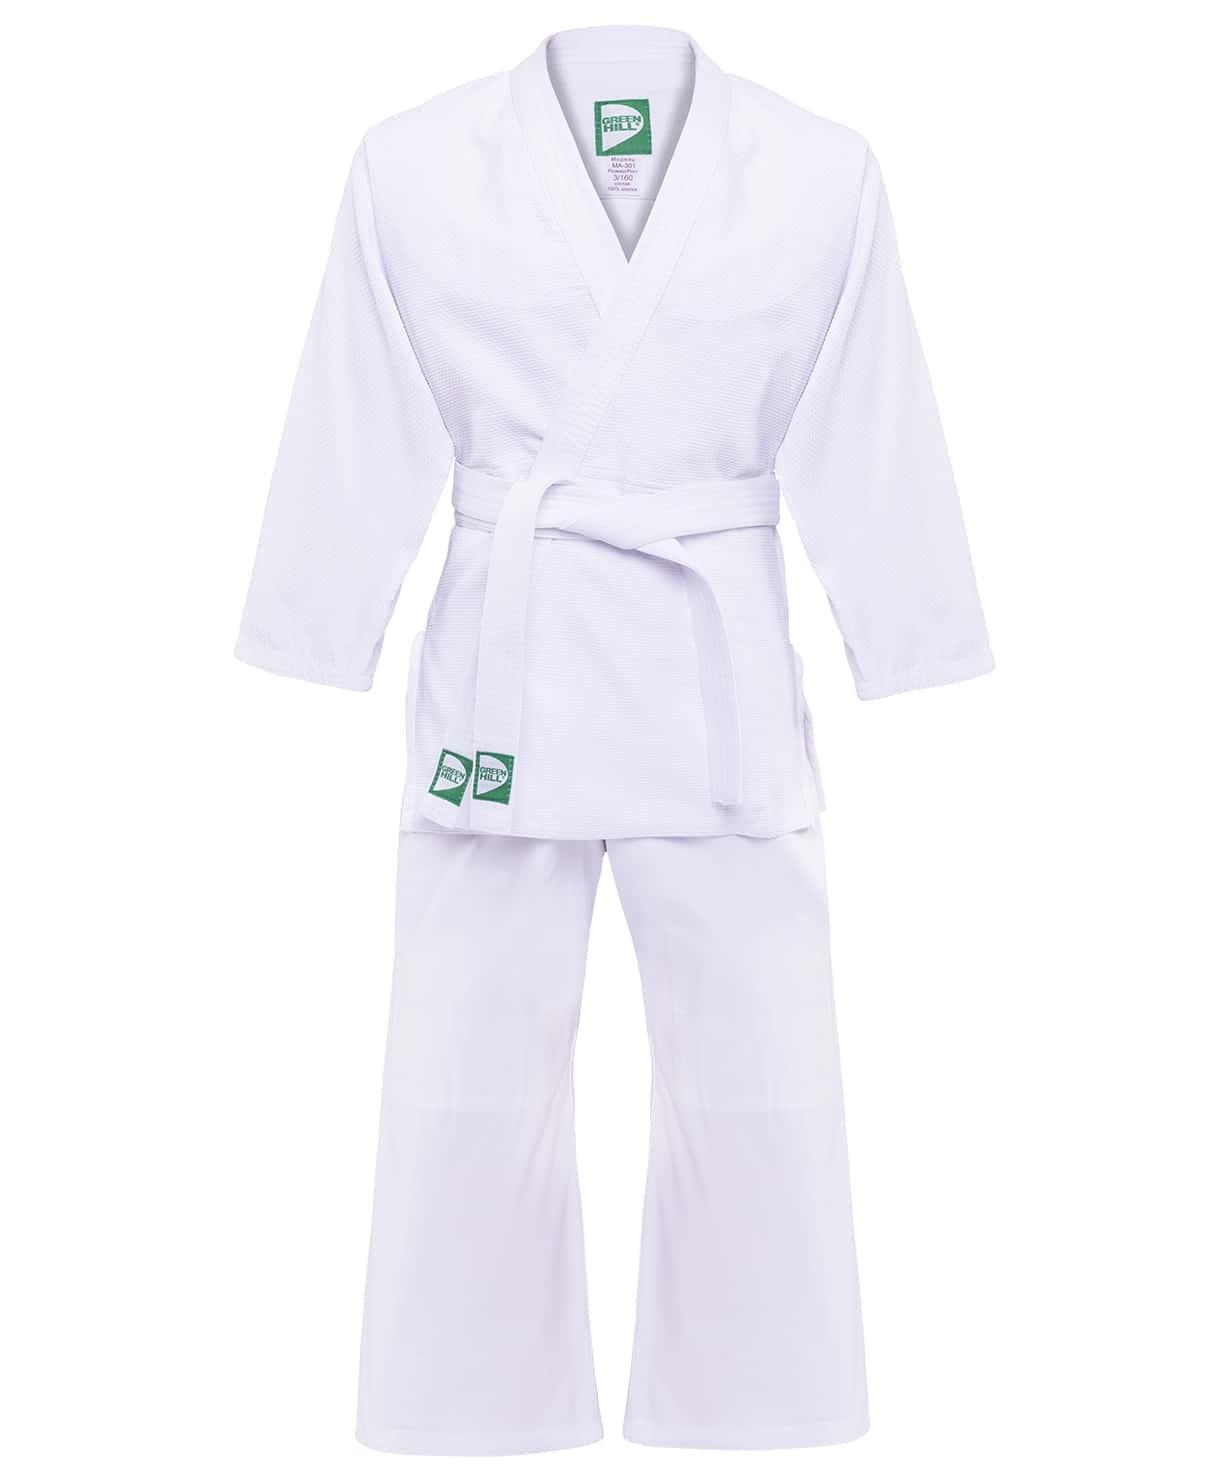 Кимоно для дзюдо MA-301 белый, р.2/150